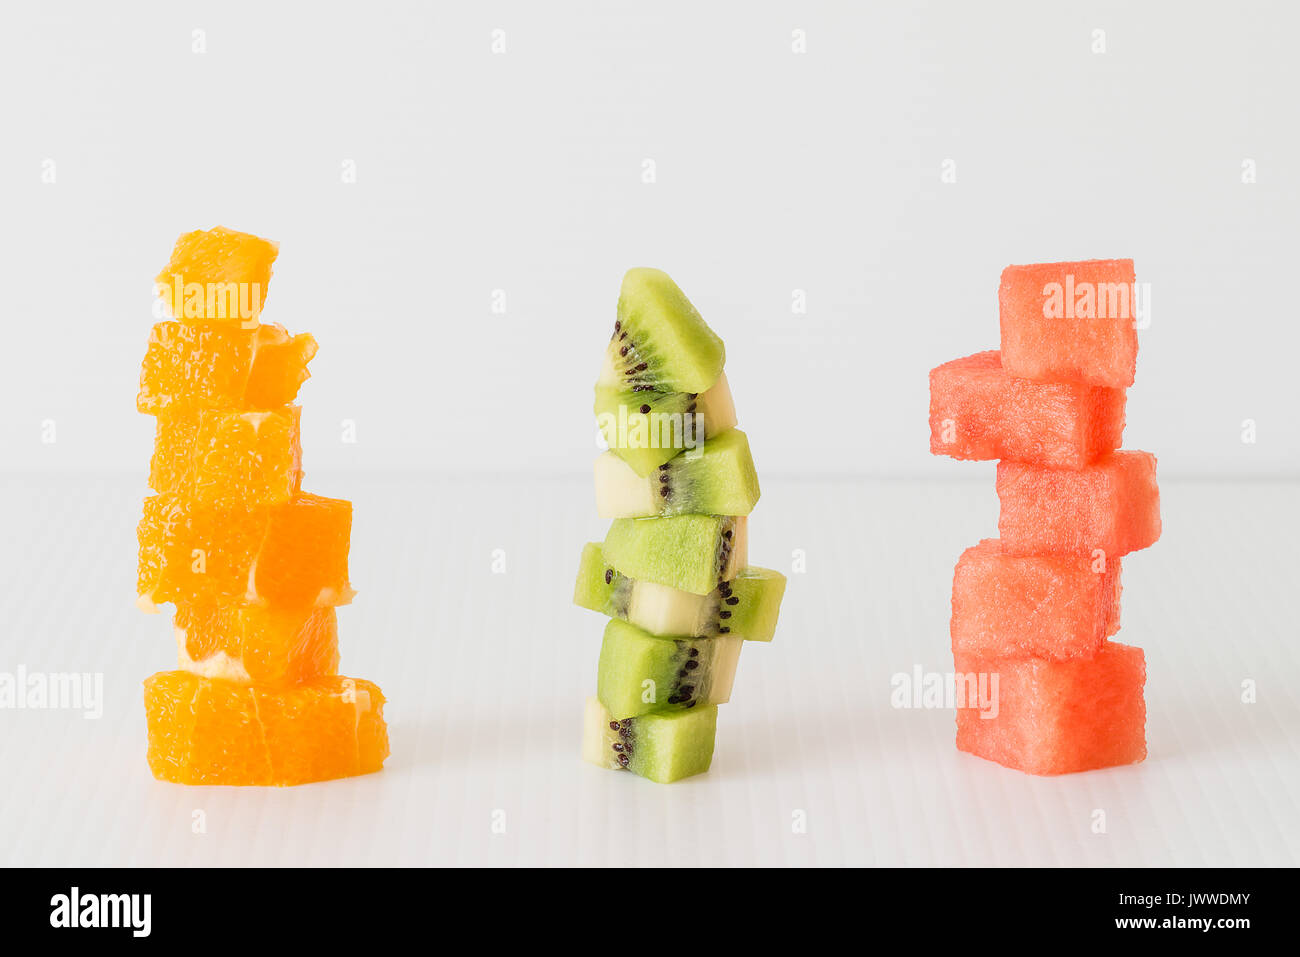 Three stacks of chopped fresh summer fruits: orange, kiwi, watermelon. Healthy snack concept. Vegetarian meal - Stock Image